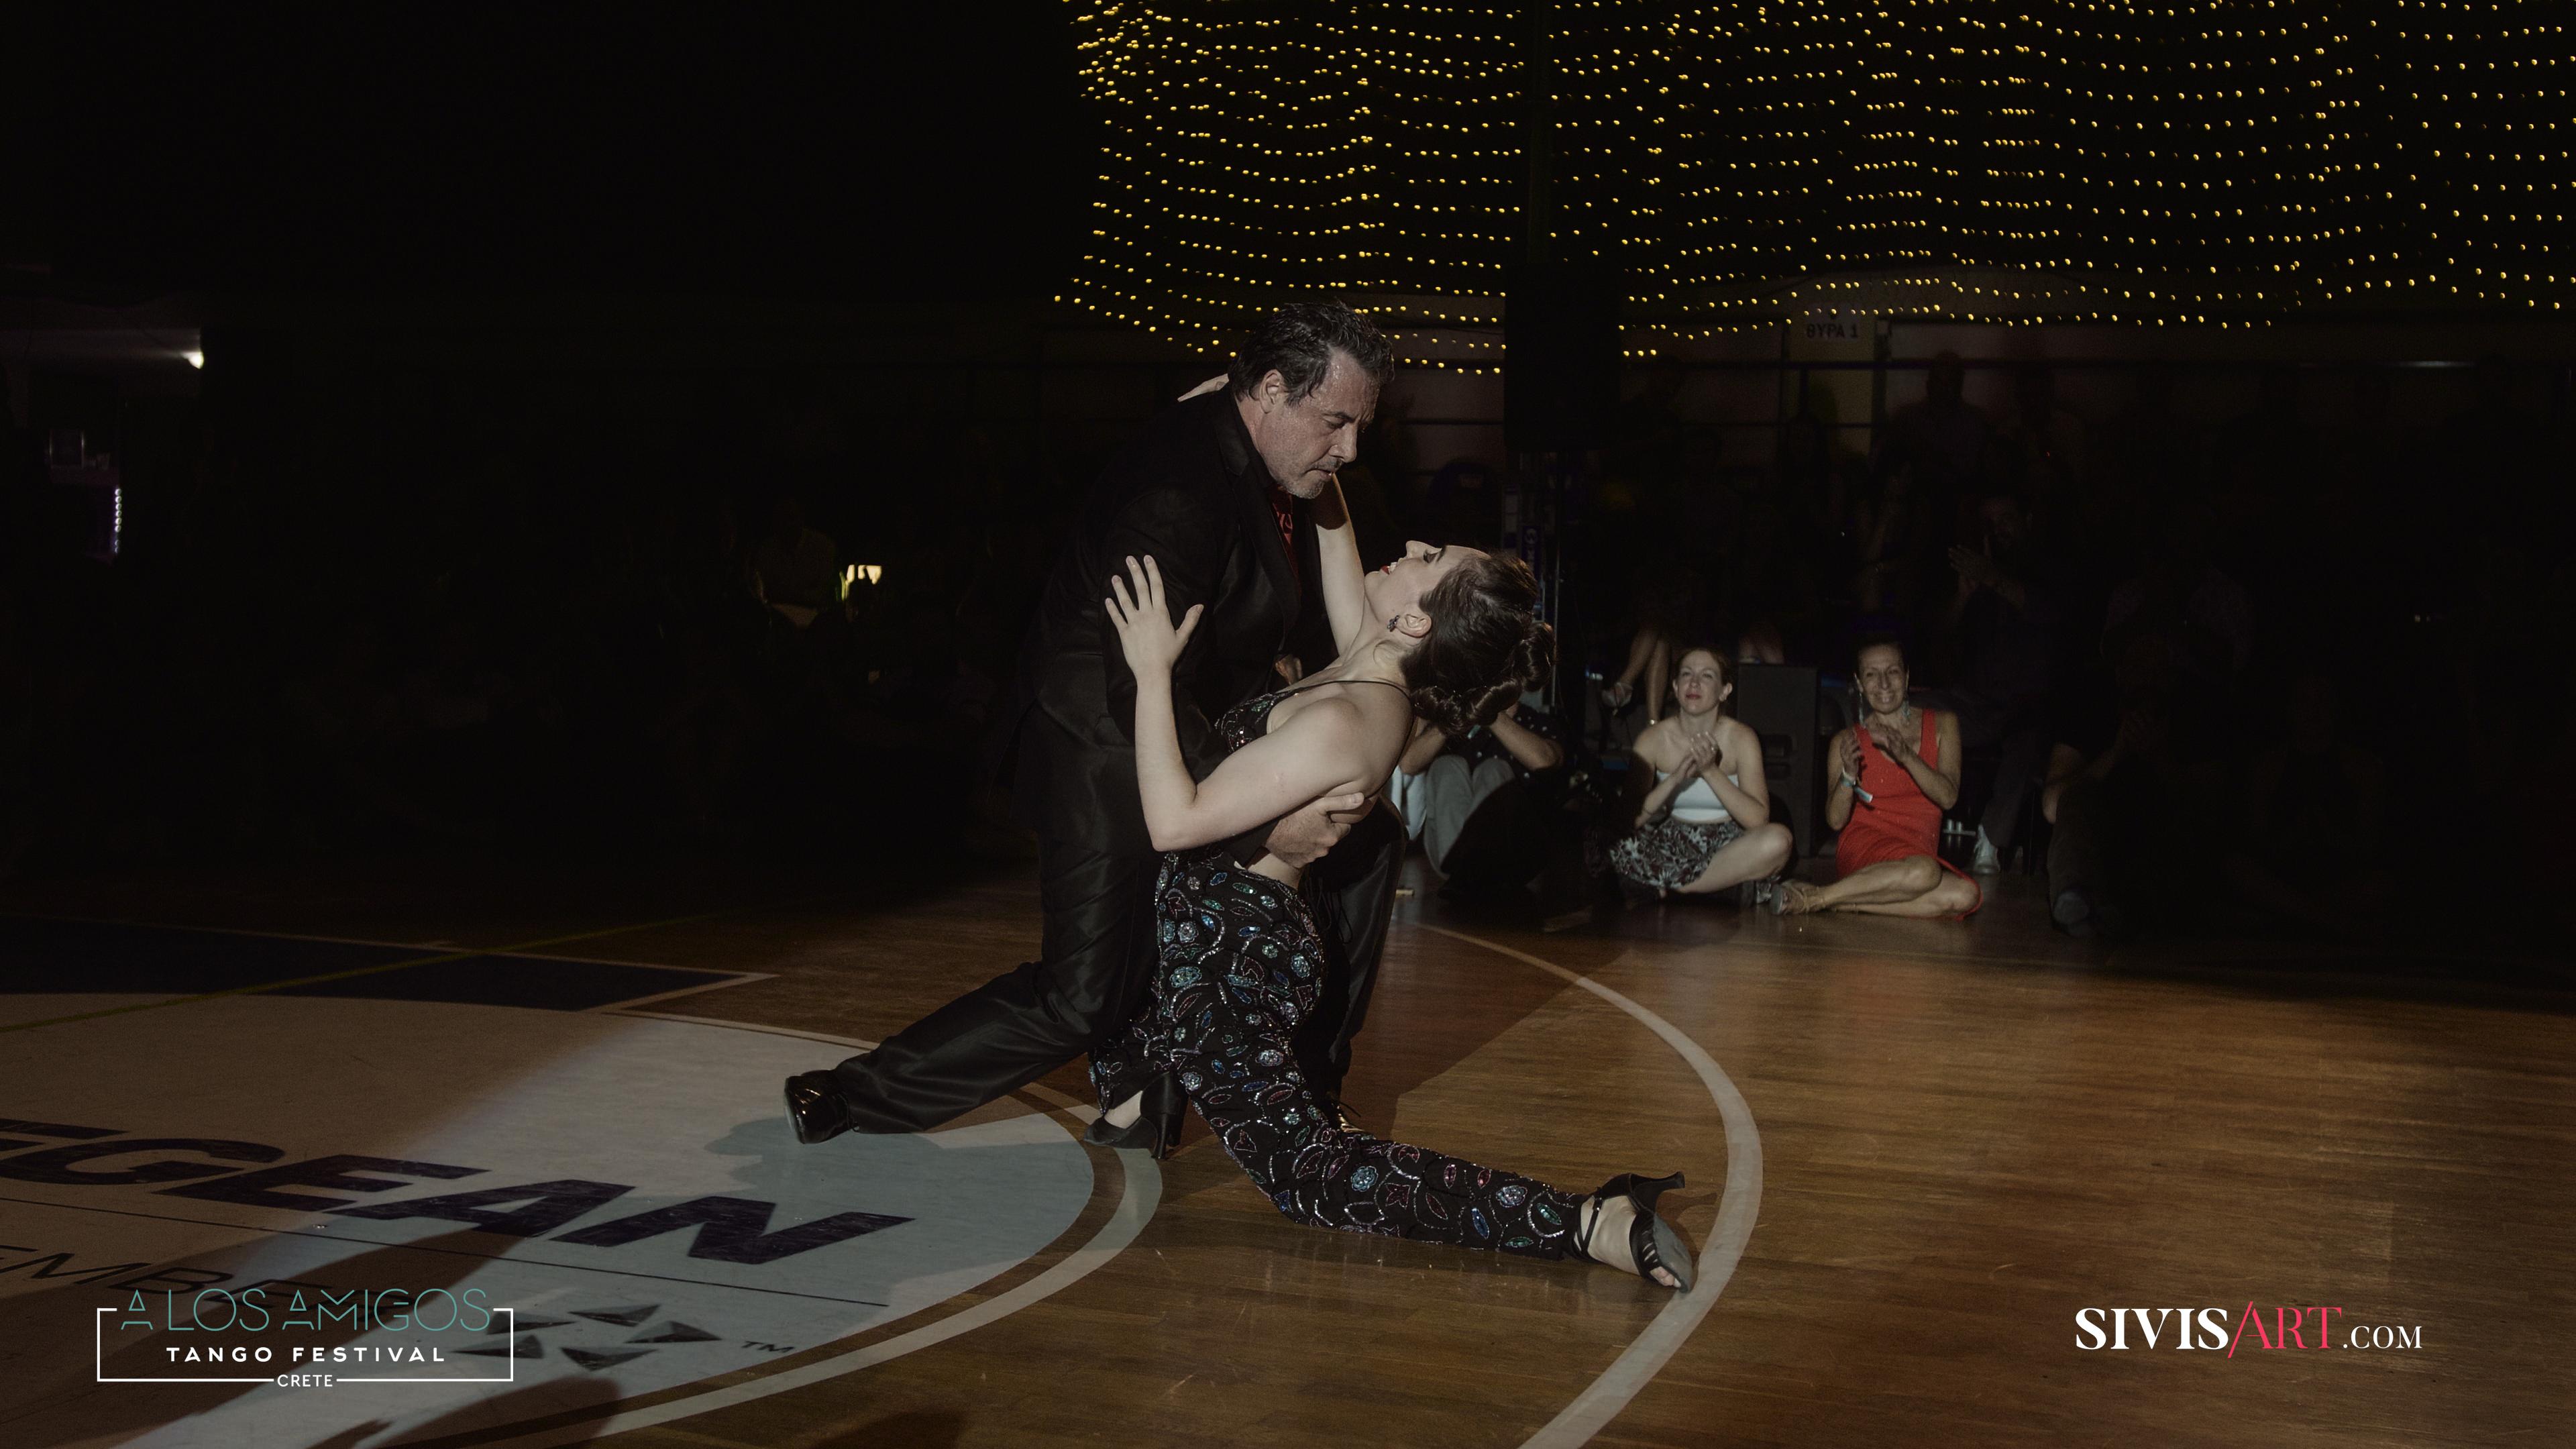 Fabian Salas & Lola Diaz